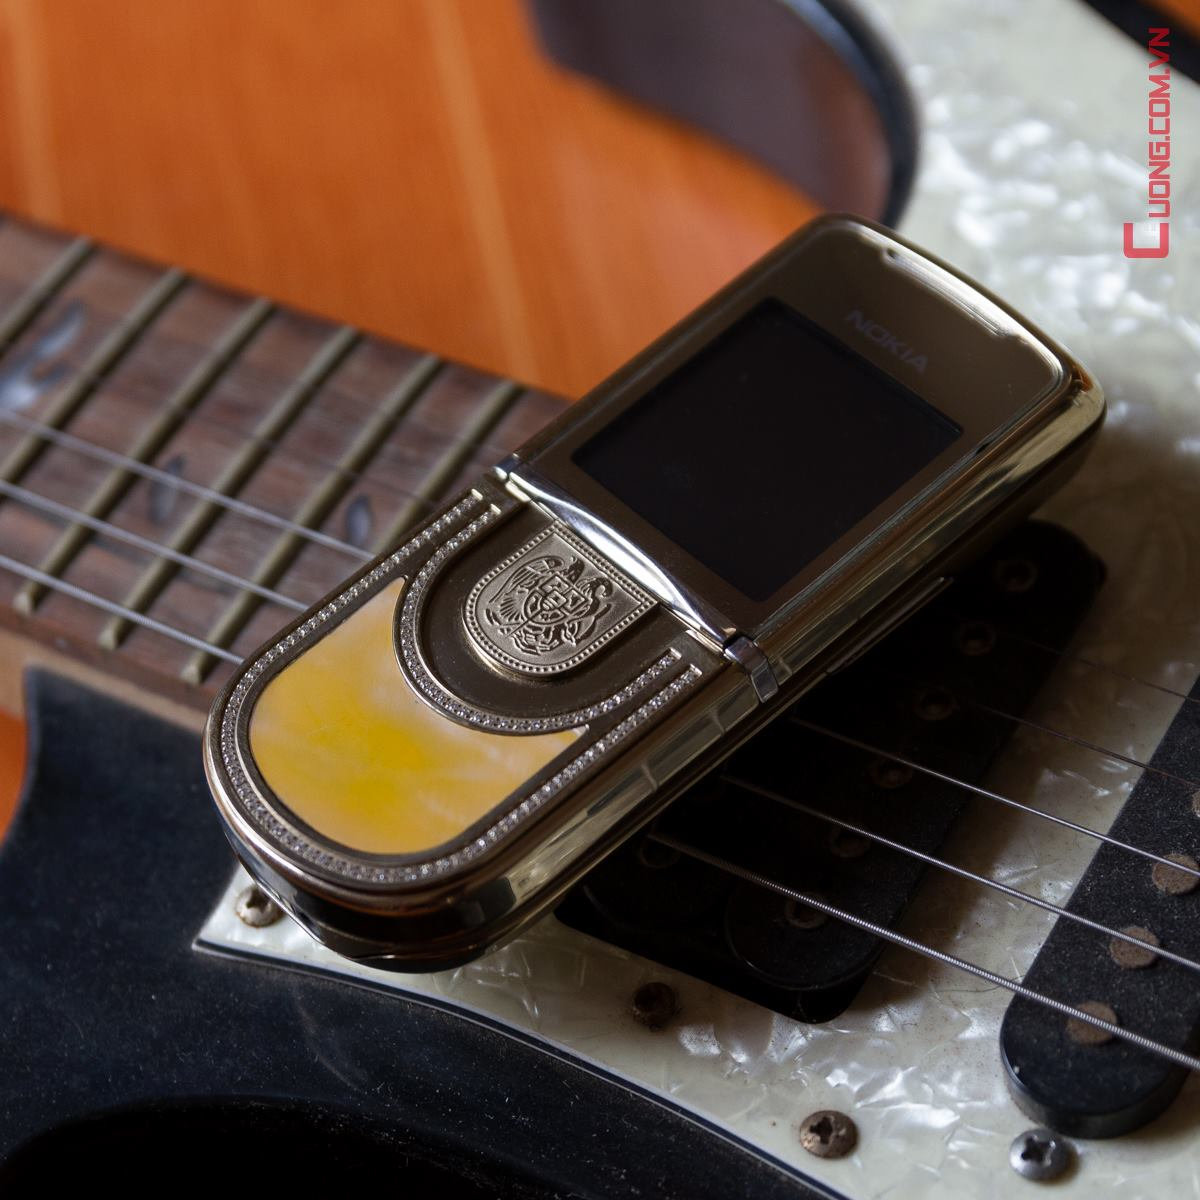 Nokia 8800 Sirocco Gold king Arte kh?m trai